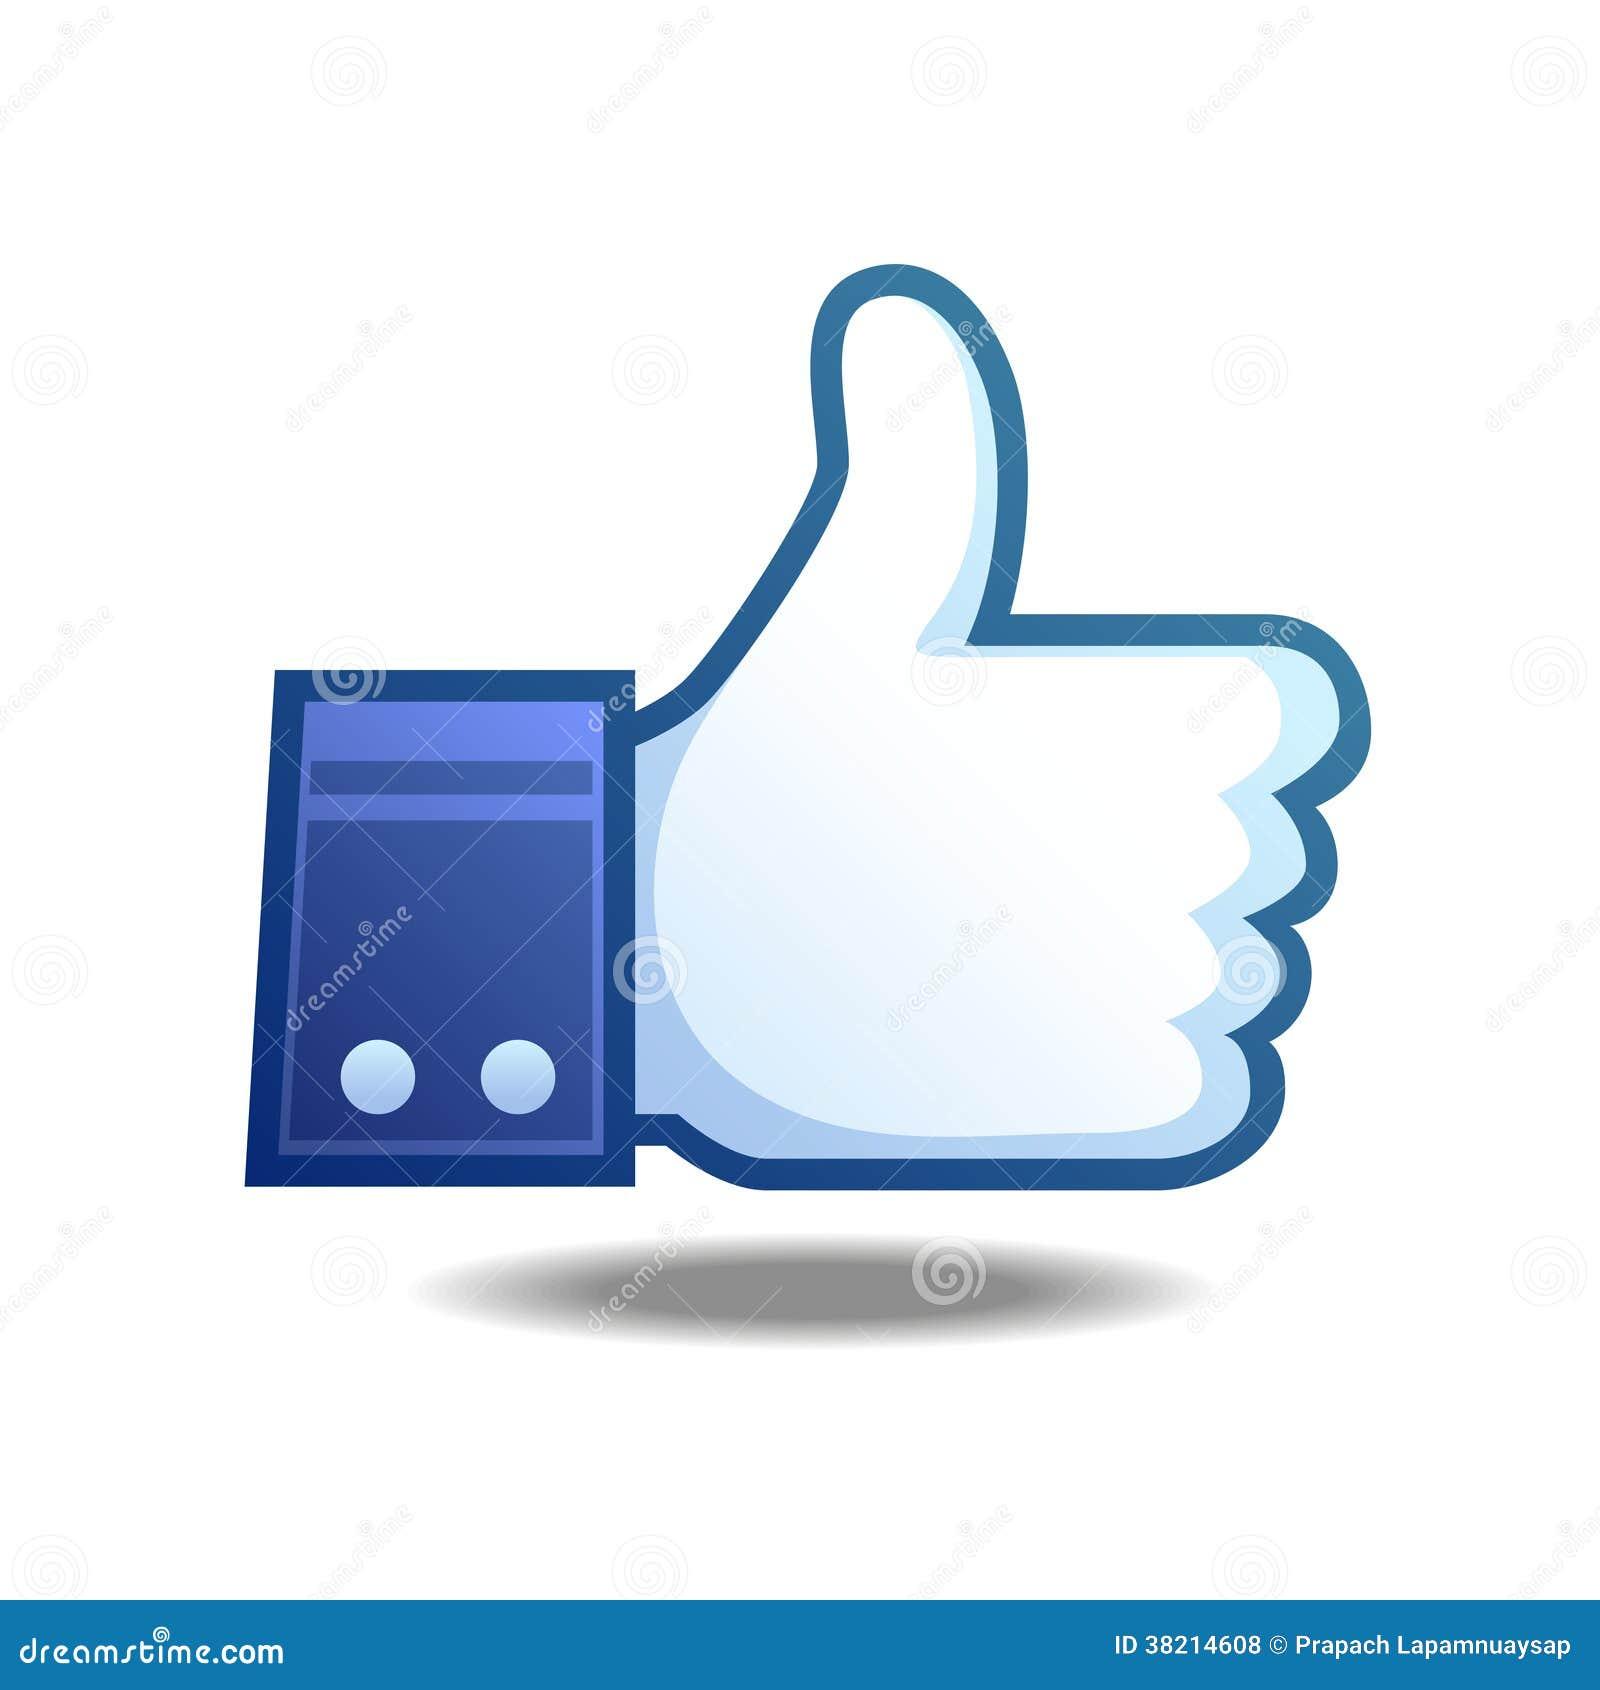 Como icono Facebook Like Icon Png Transparent